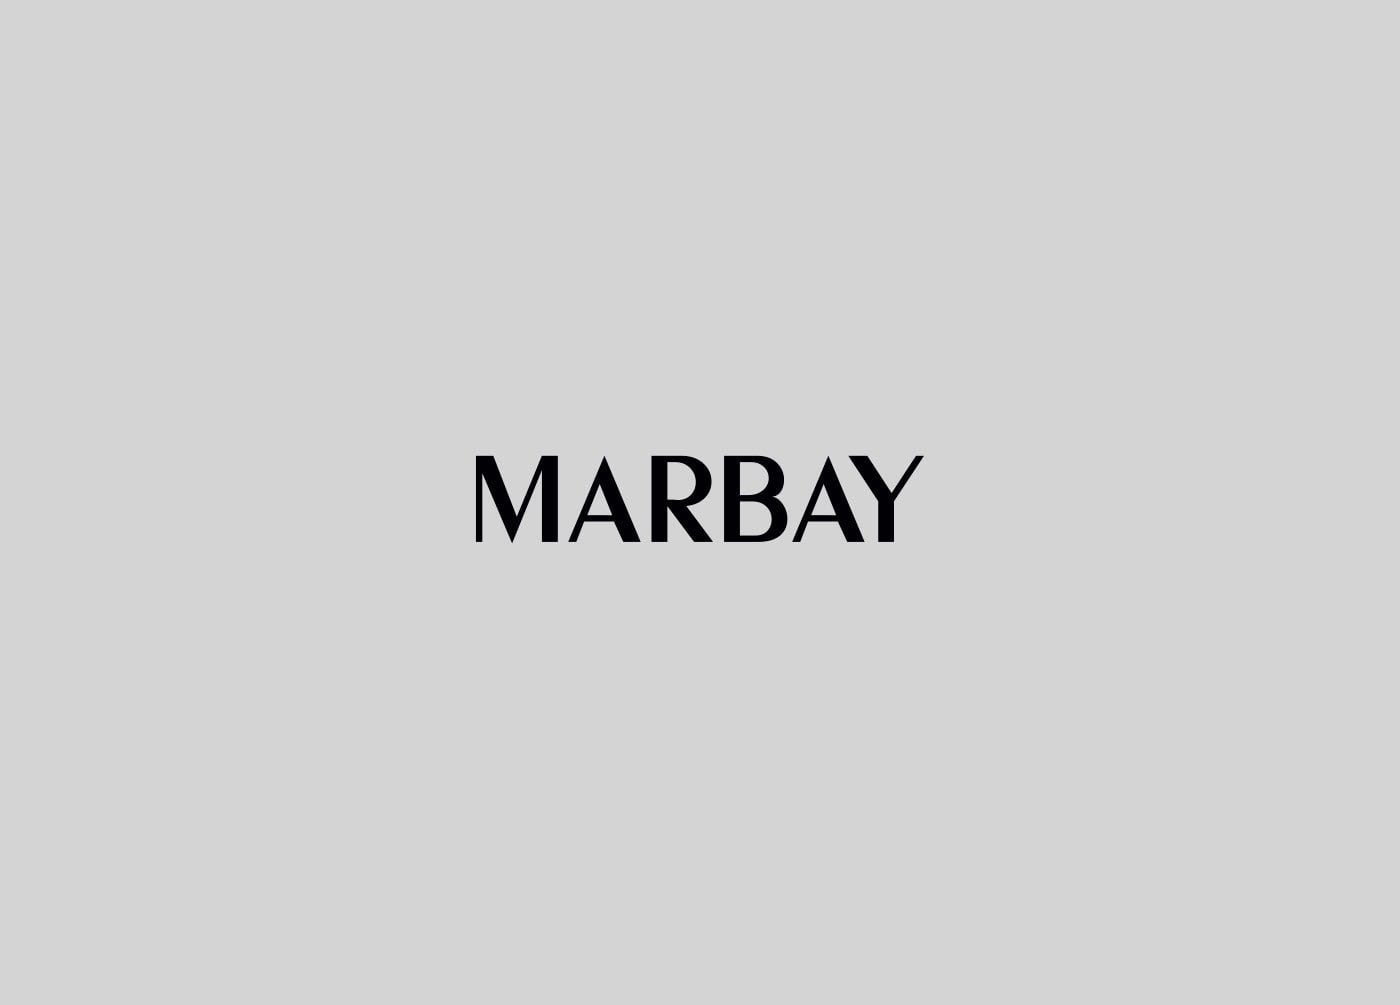 Marbay瓜子品牌VI设计